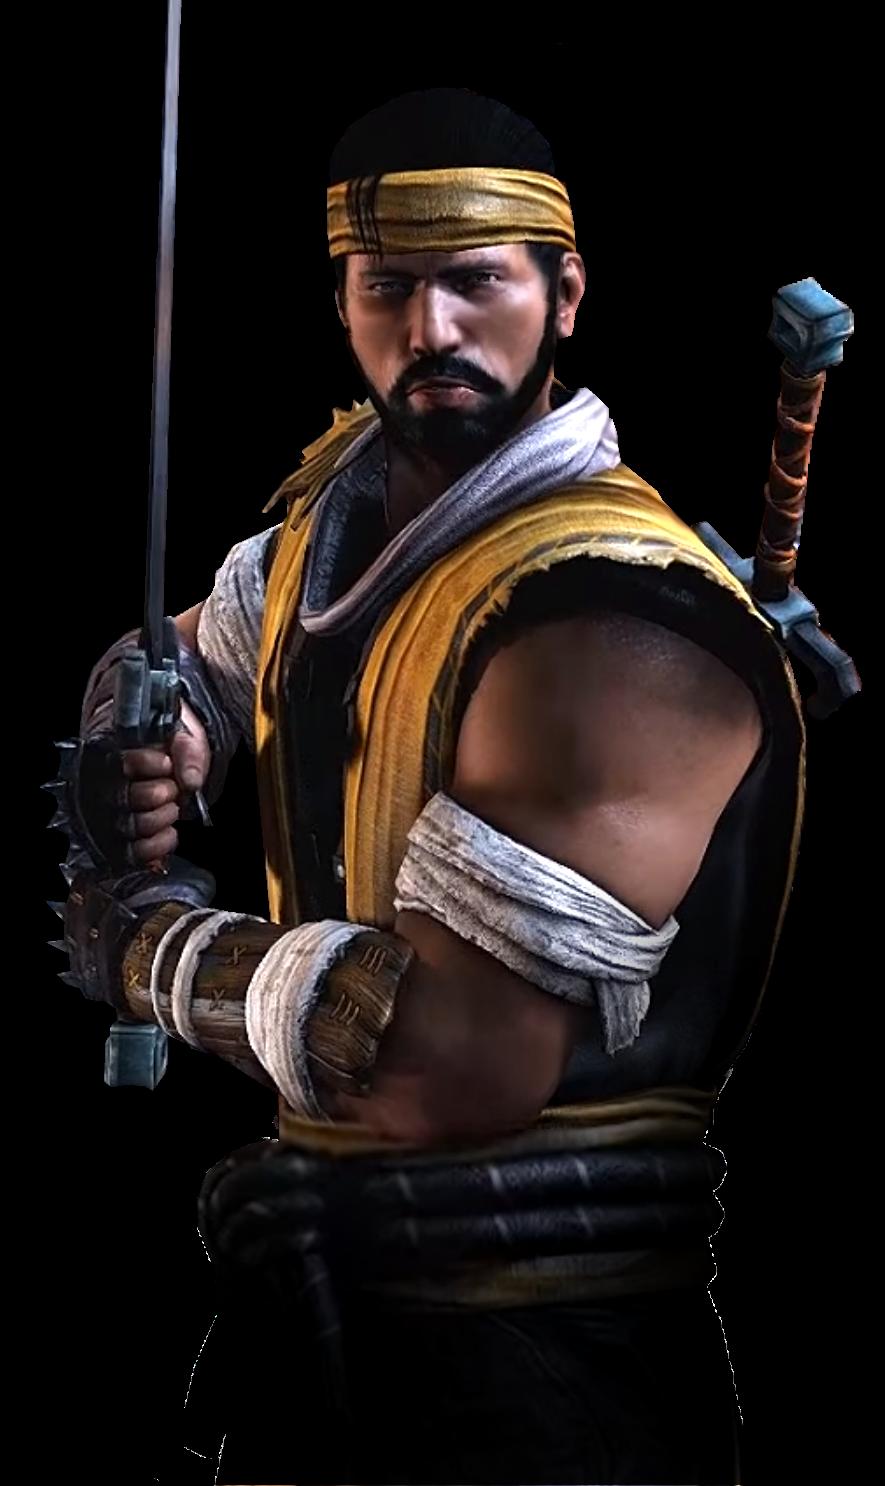 Mkx Hanzo Hasashi Render Mortal Kombat Characters Scorpion Mortal Kombat Mortal Kombat